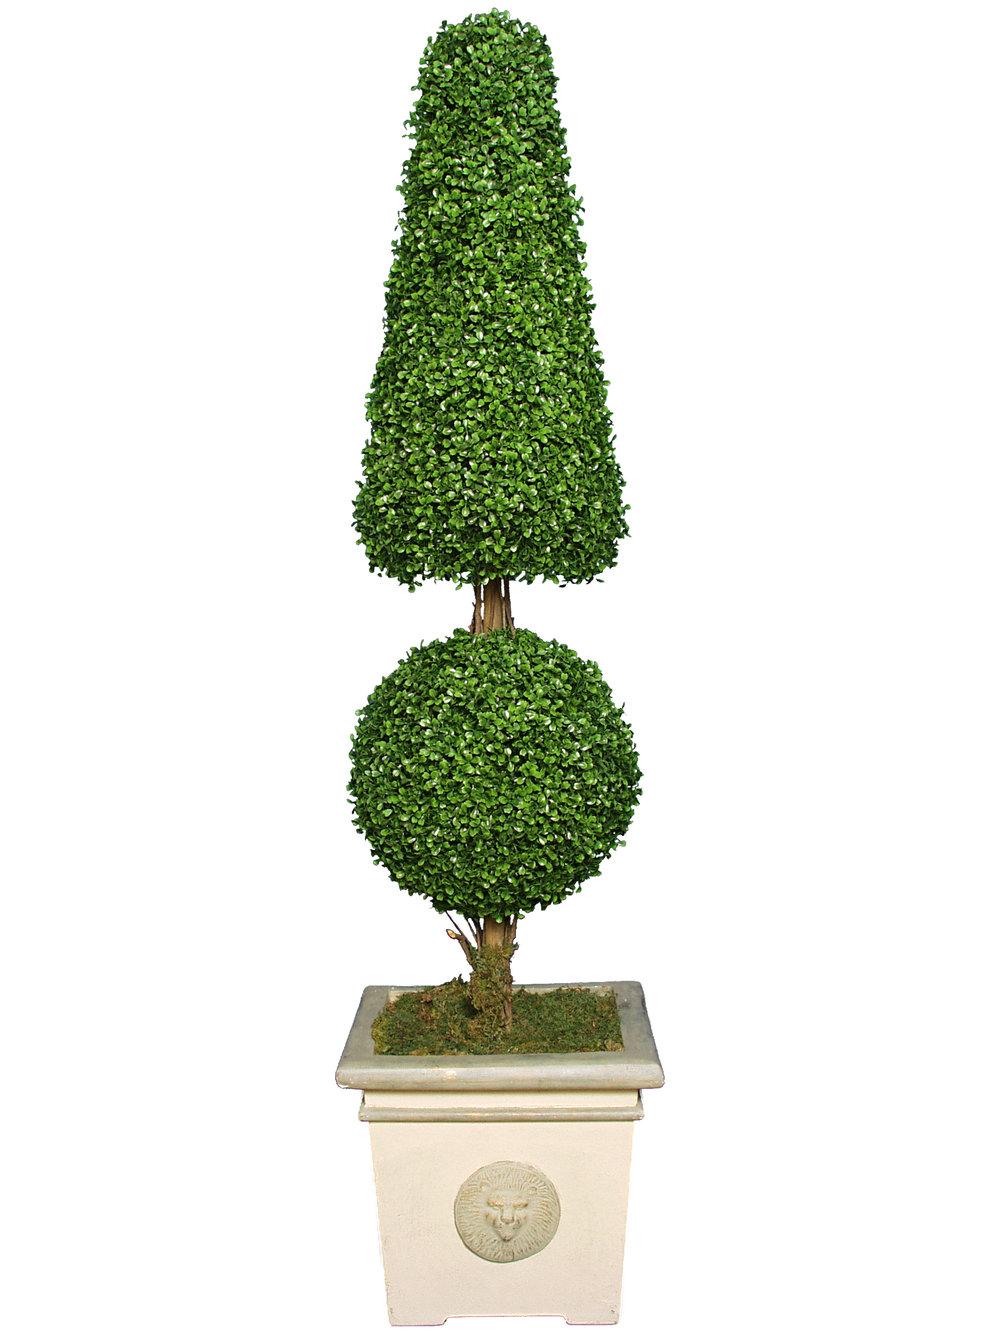 TSP 1167- Boxwood Cone & Ball Topiary